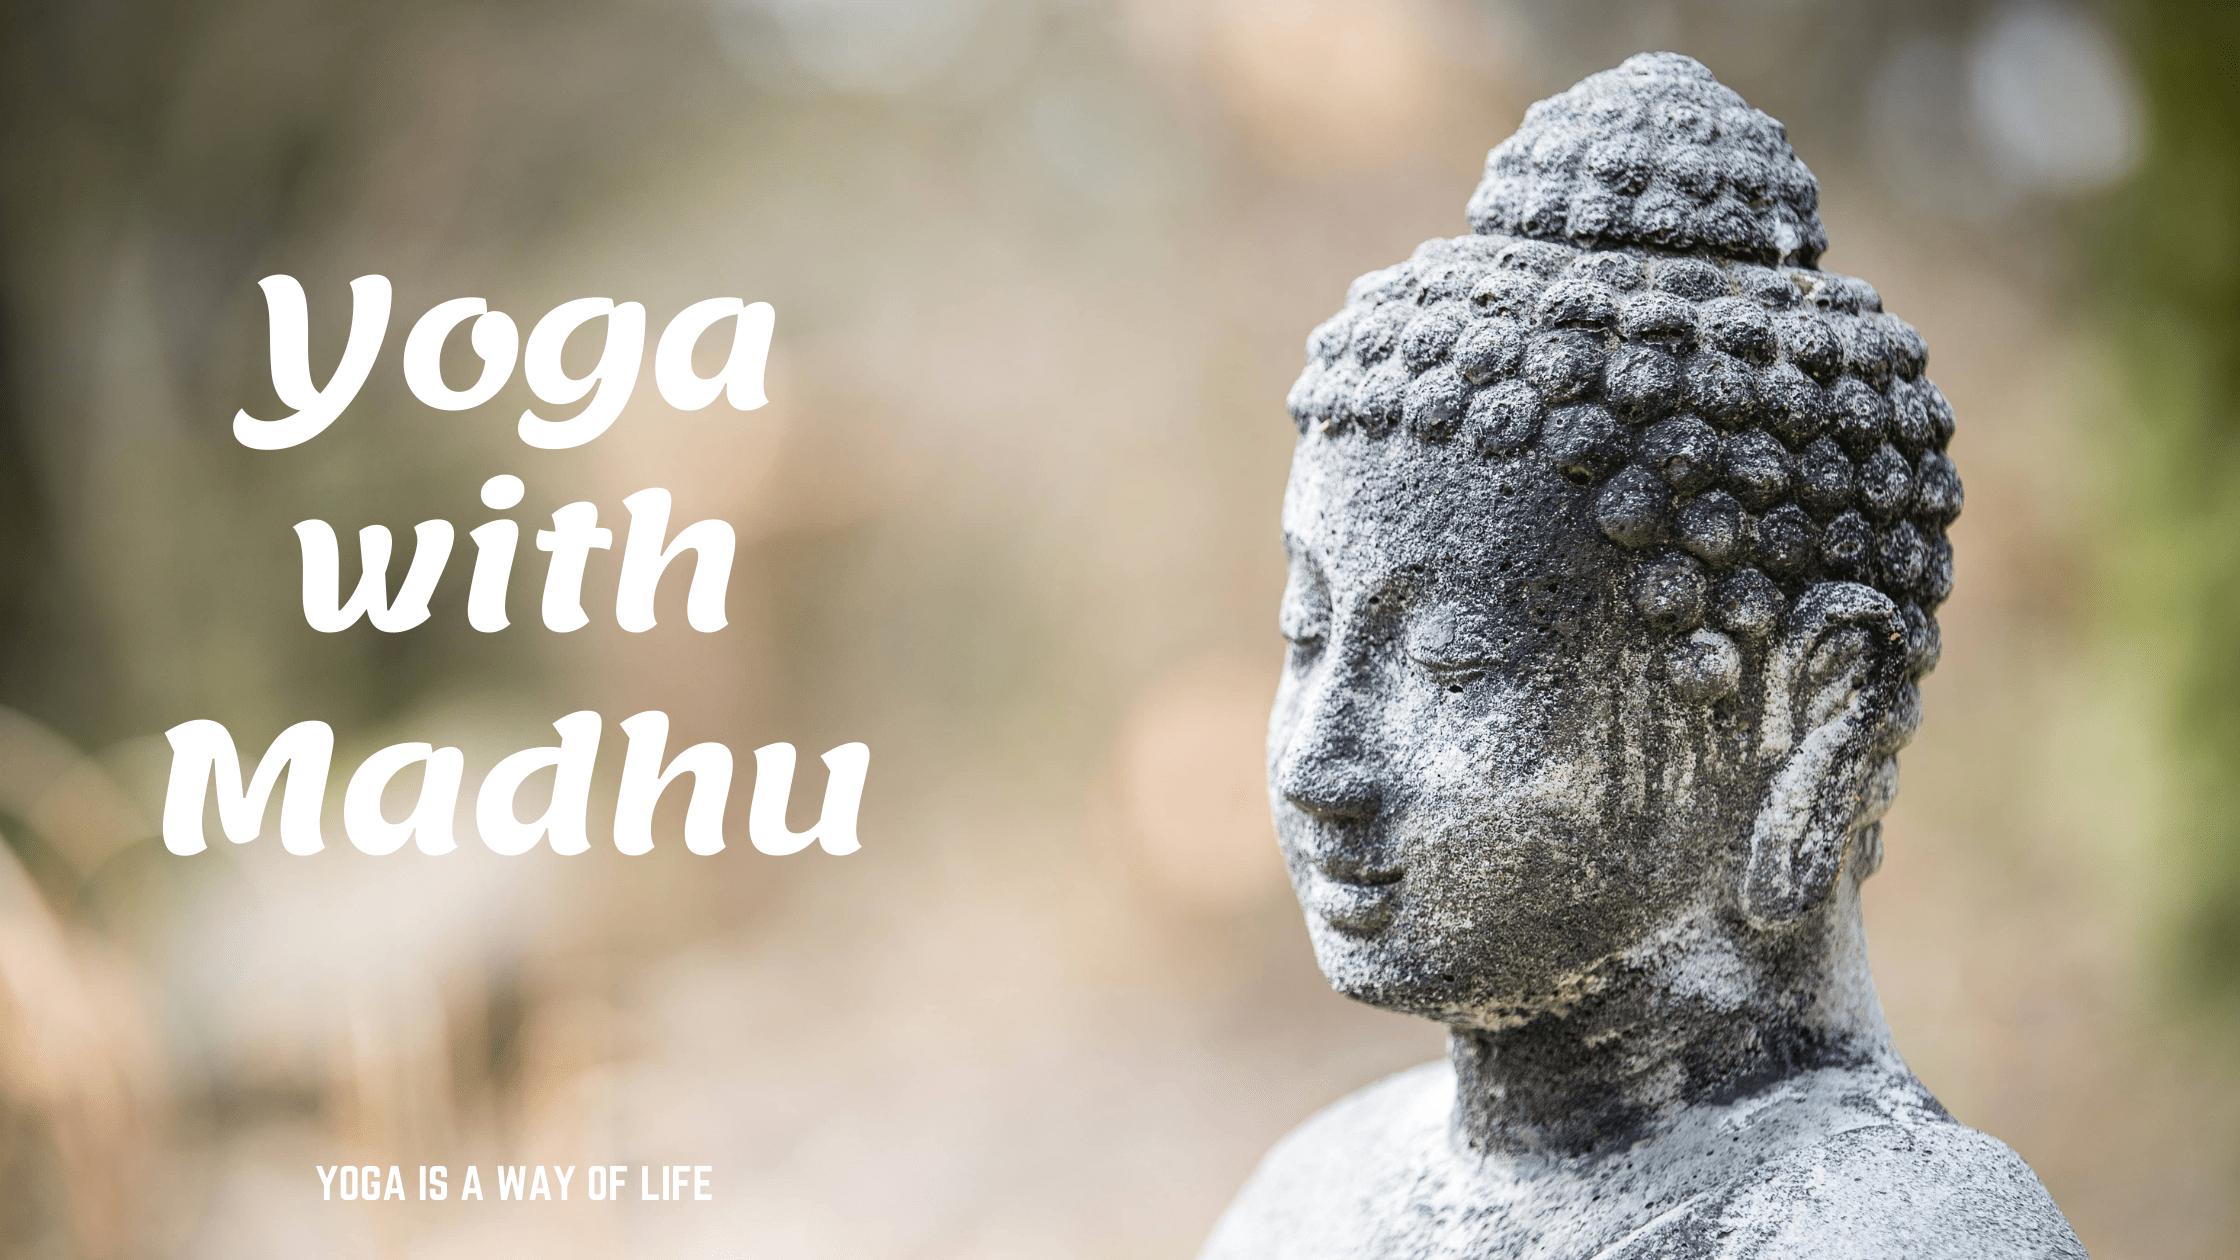 Yoga with Madhu